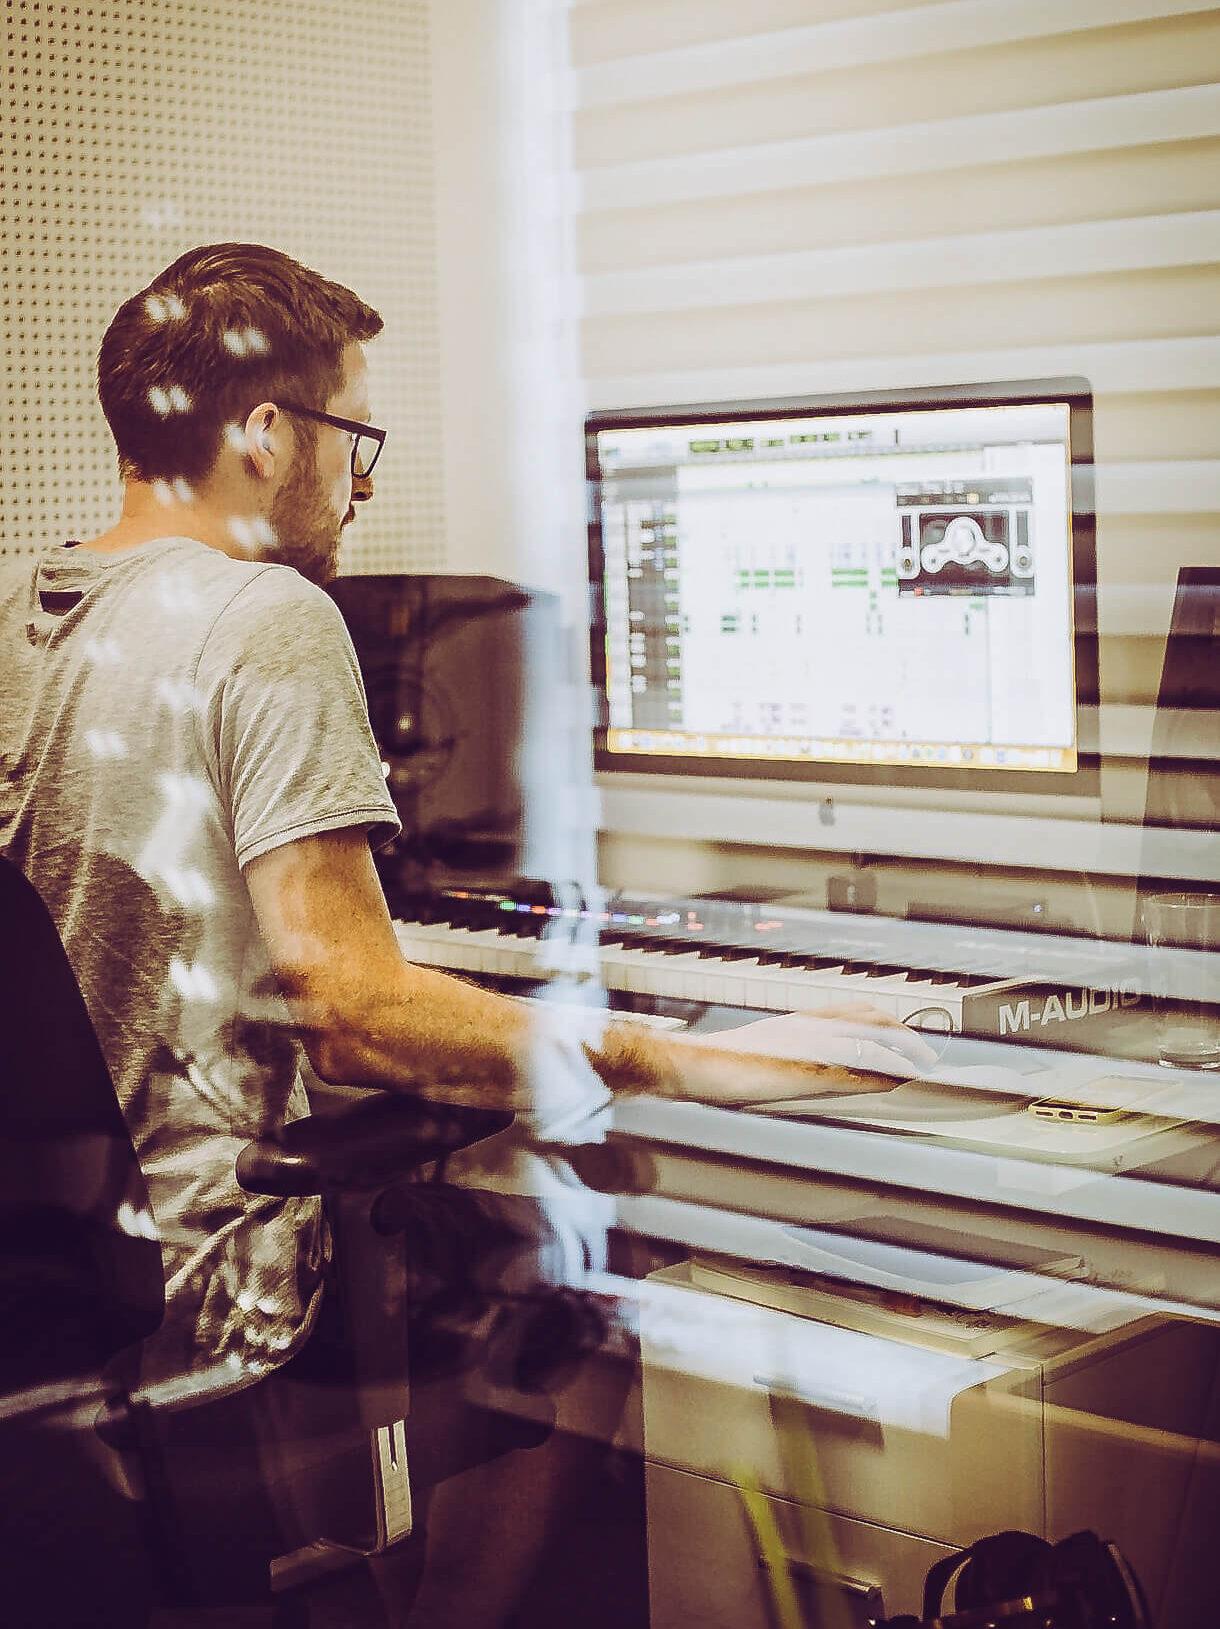 Producer vorm Bildschirm